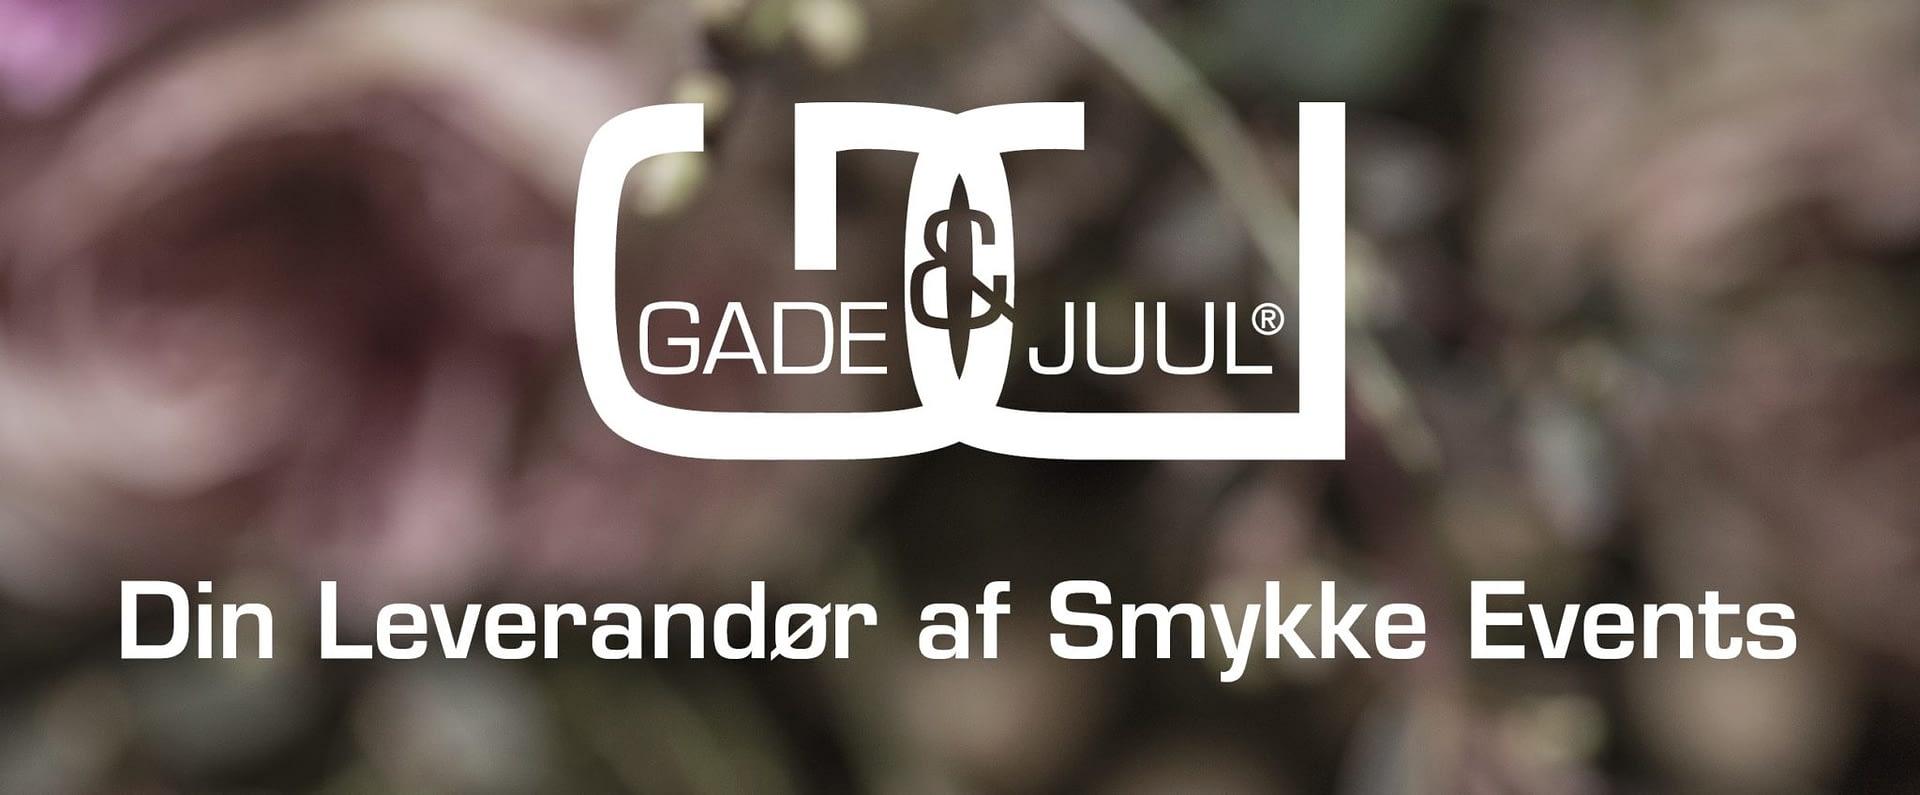 Logo for Gade&Juul